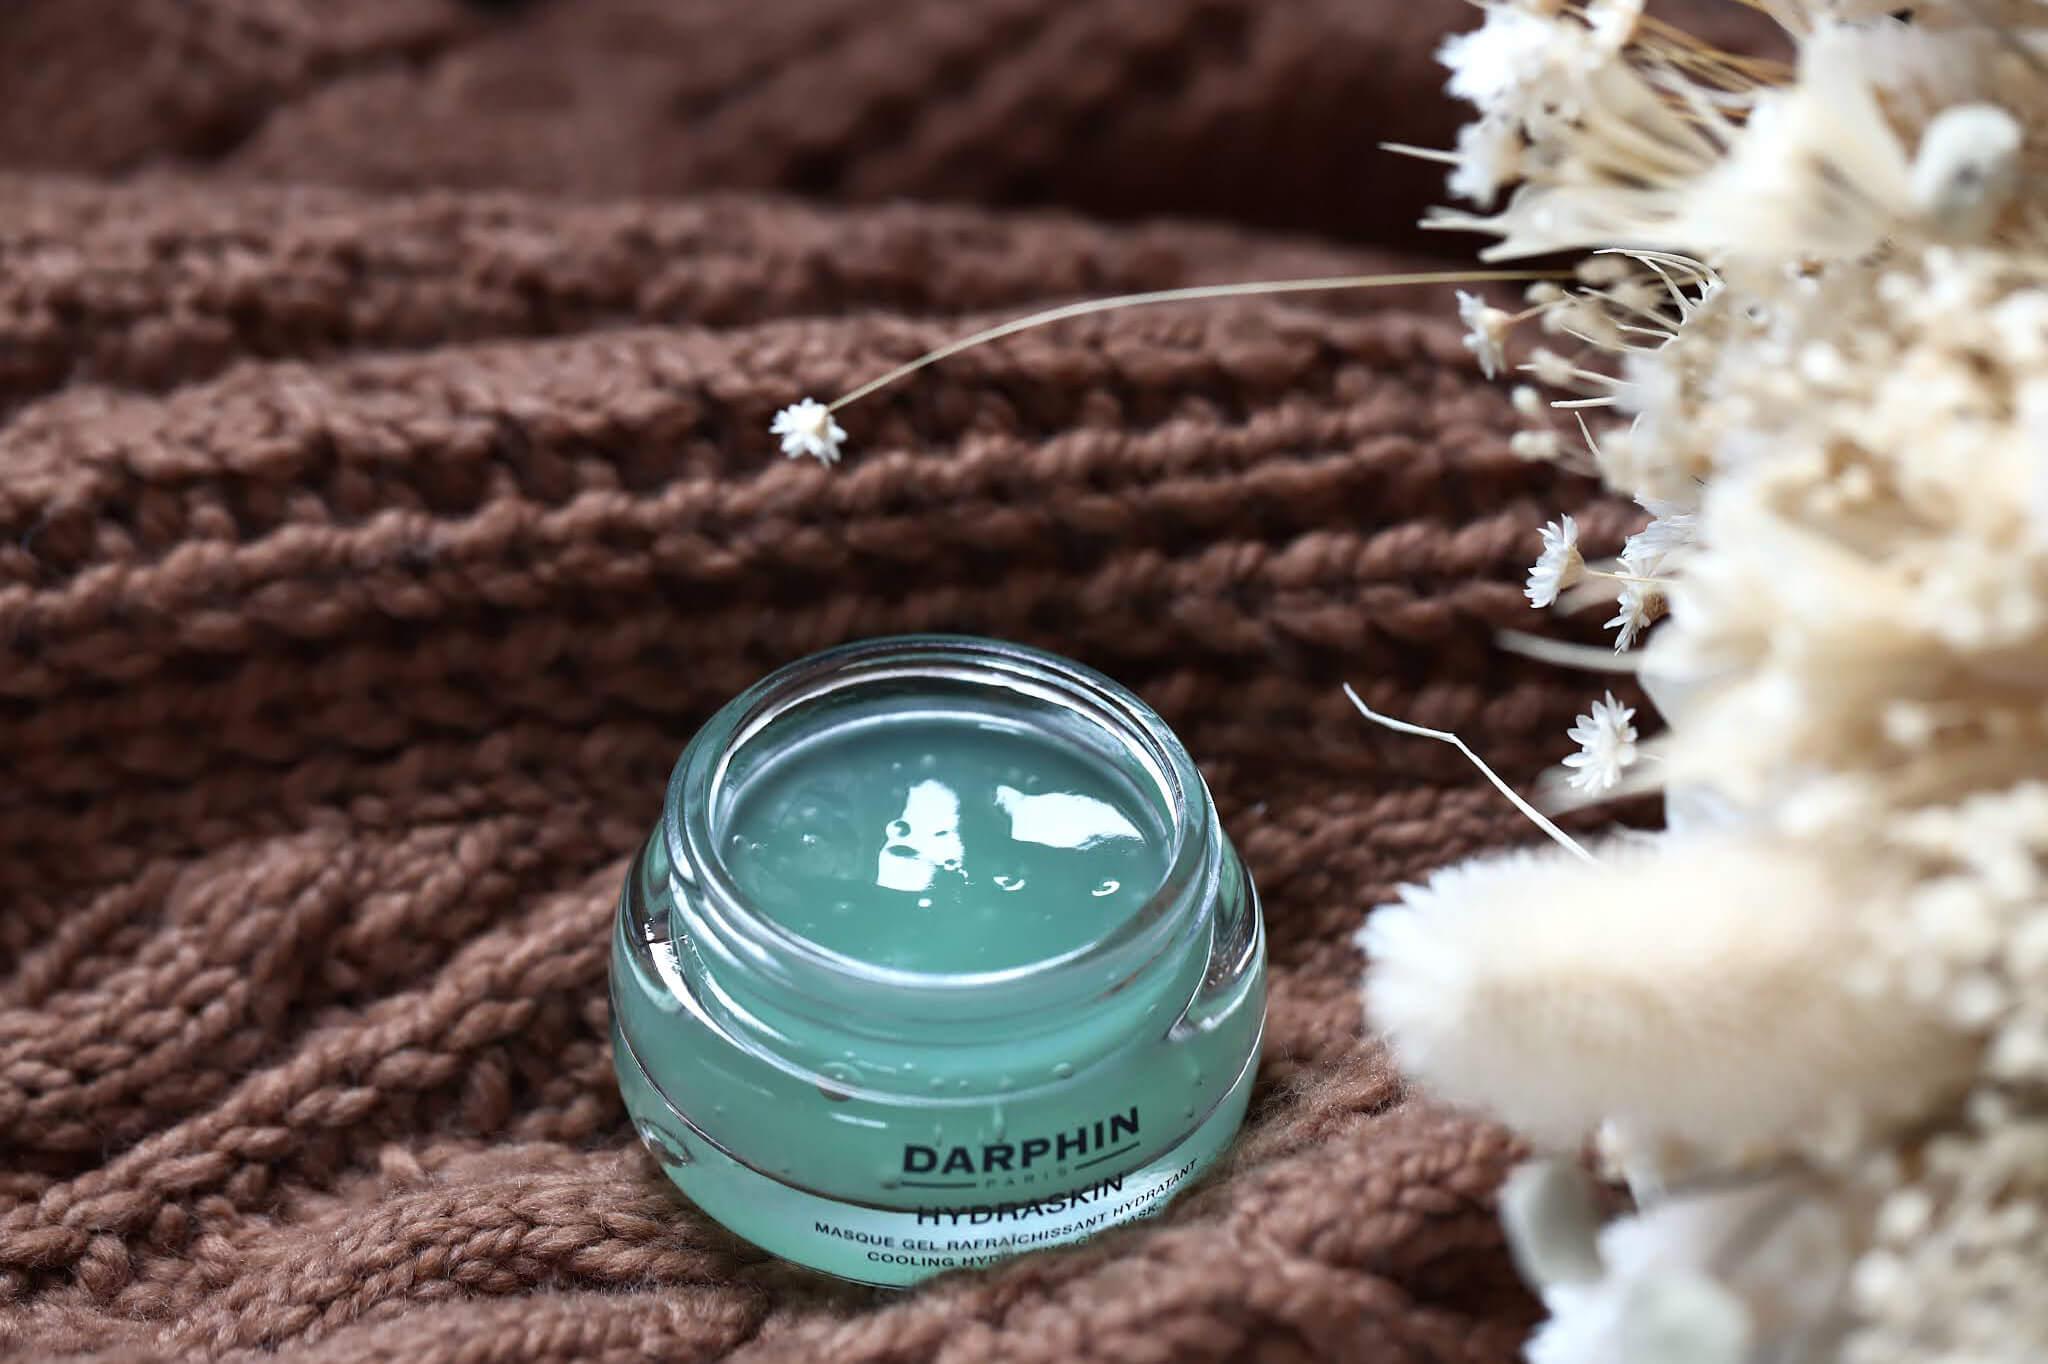 Darphin Hydraskin Masque Gel Hydratant